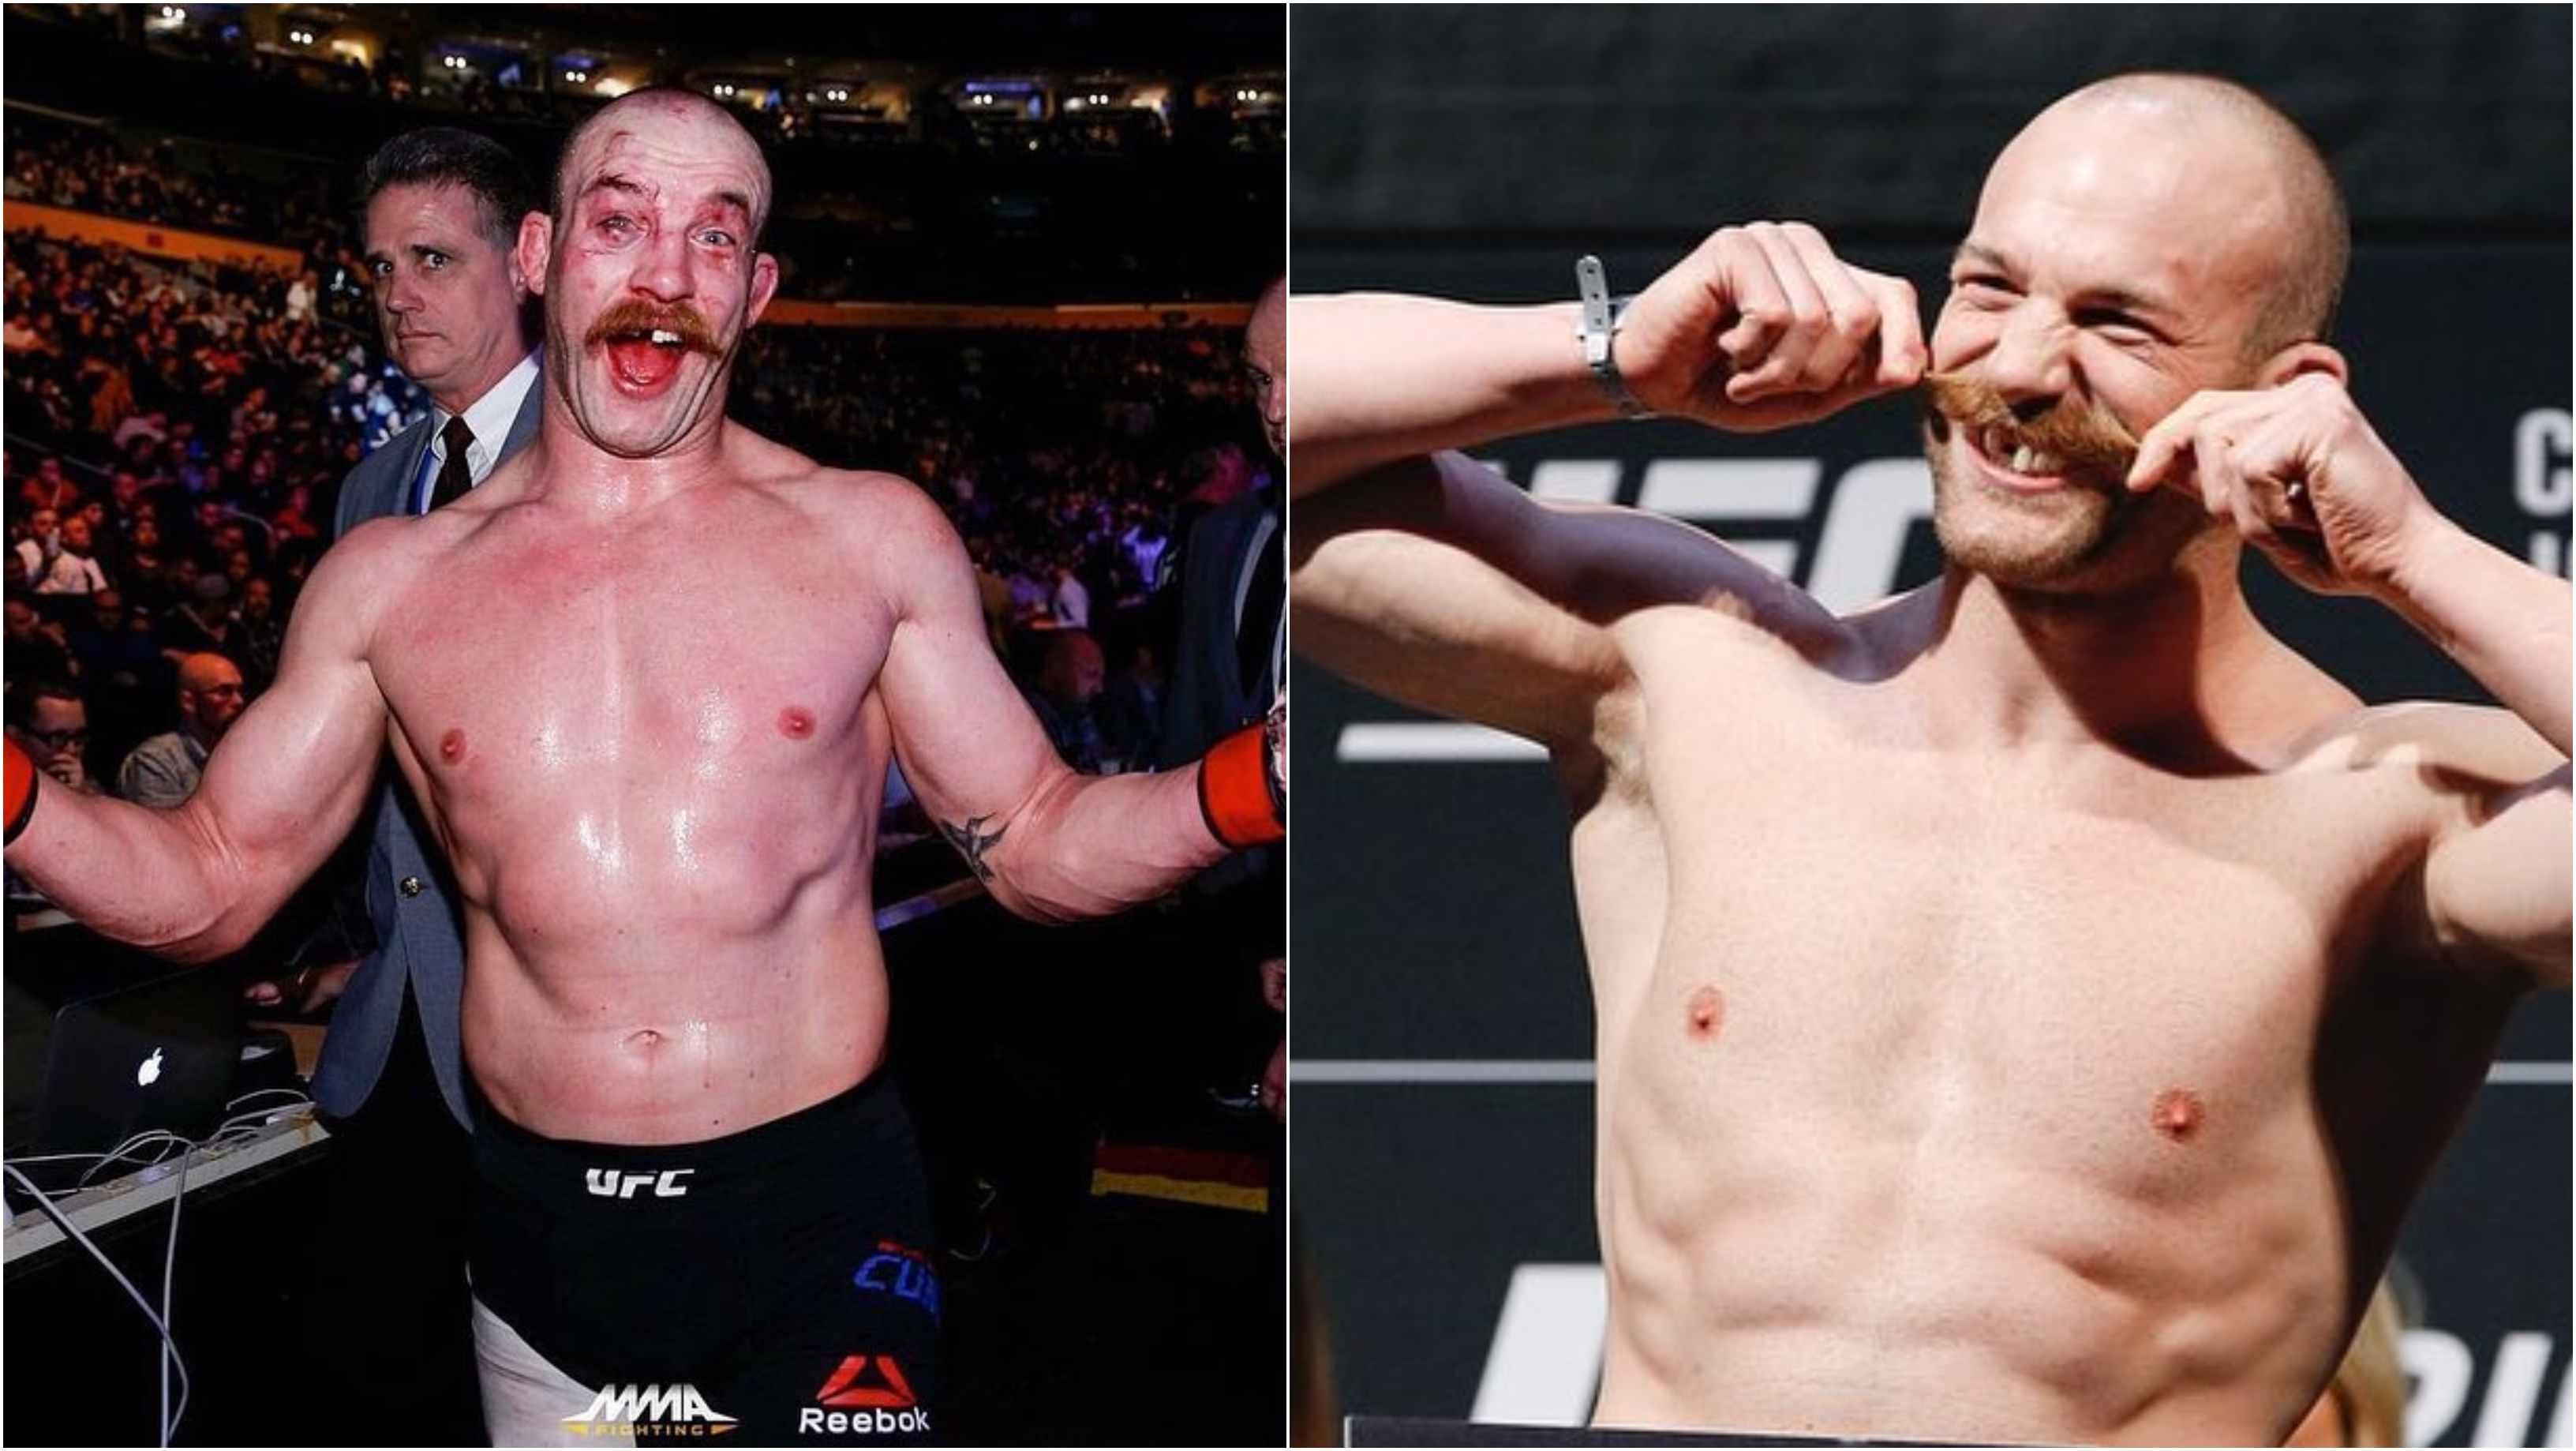 UFC LHW Patrick Cummins pulls down the curtains on his MMA career - Cummins